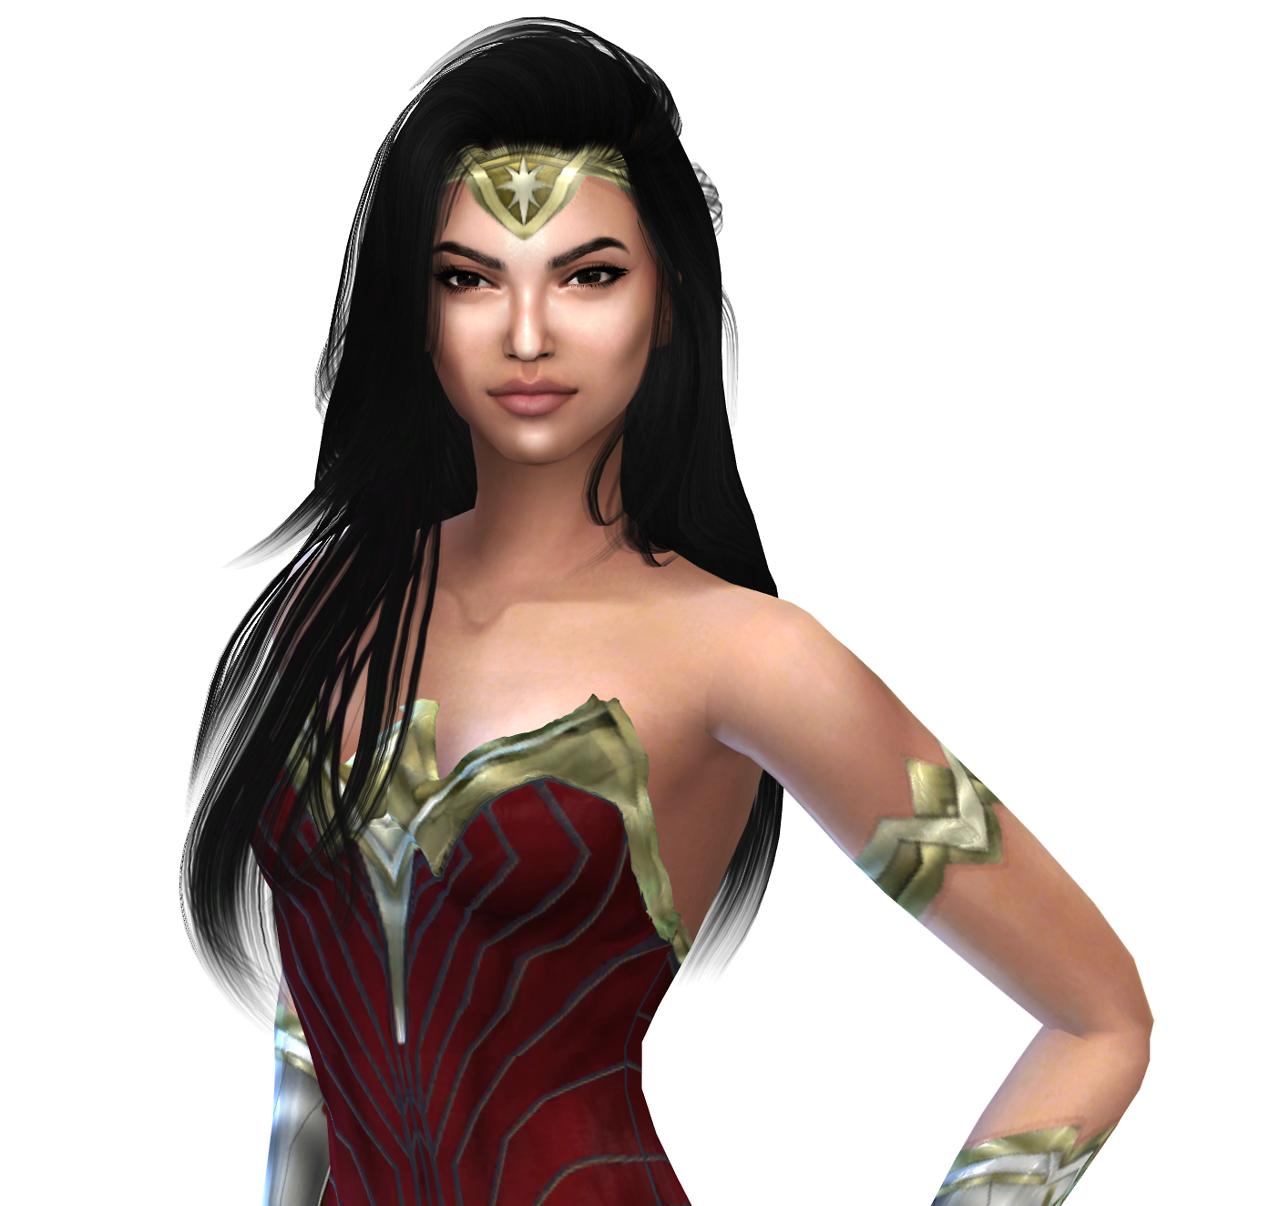 Moon Galaxy Sims: The Sims 4 Wonder Woman